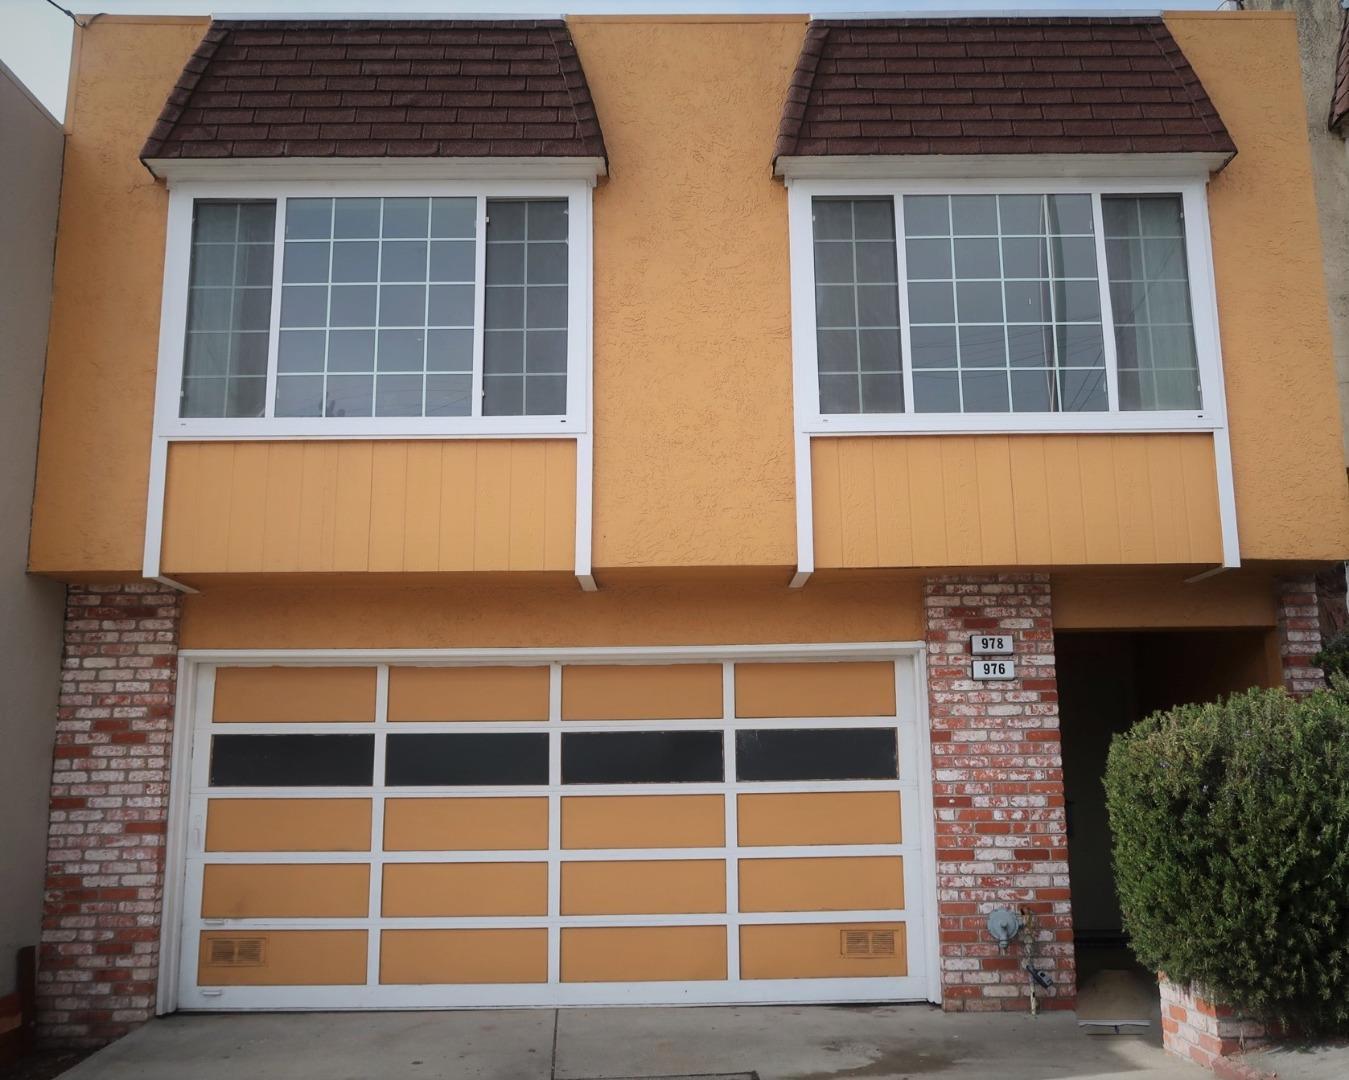 976 & 978 Hillside Boulevard Daly City, CA 94014